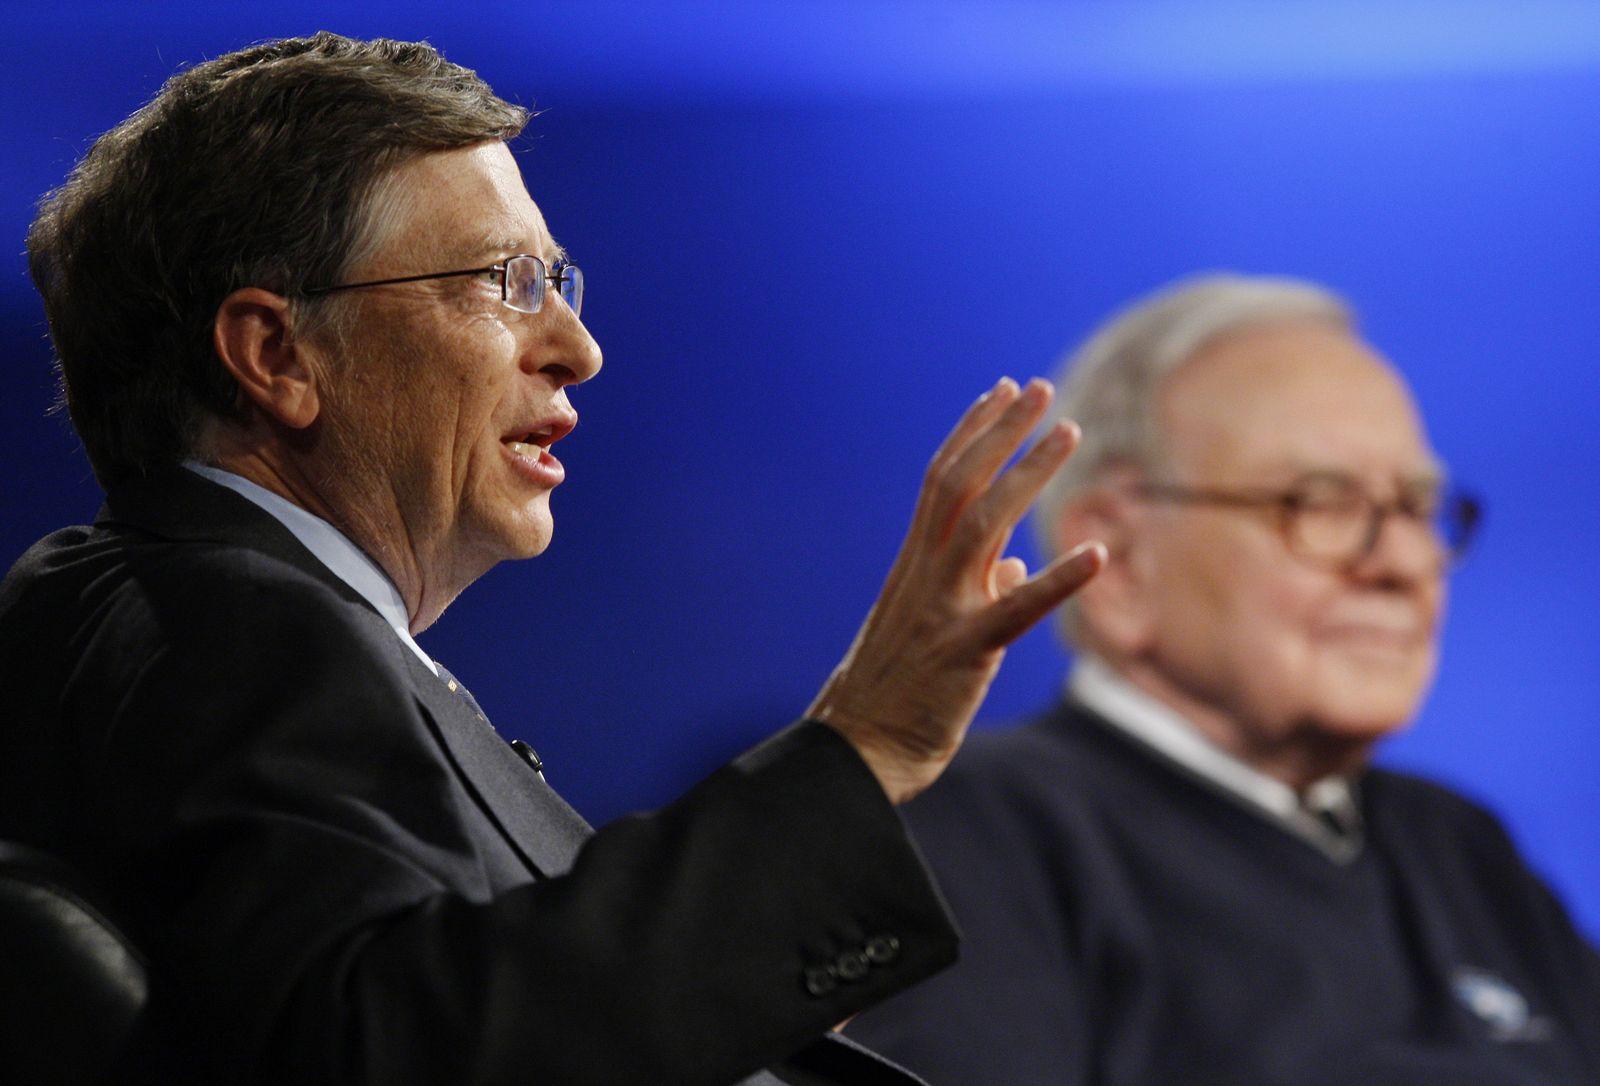 Warren Buffett / Bill Gates